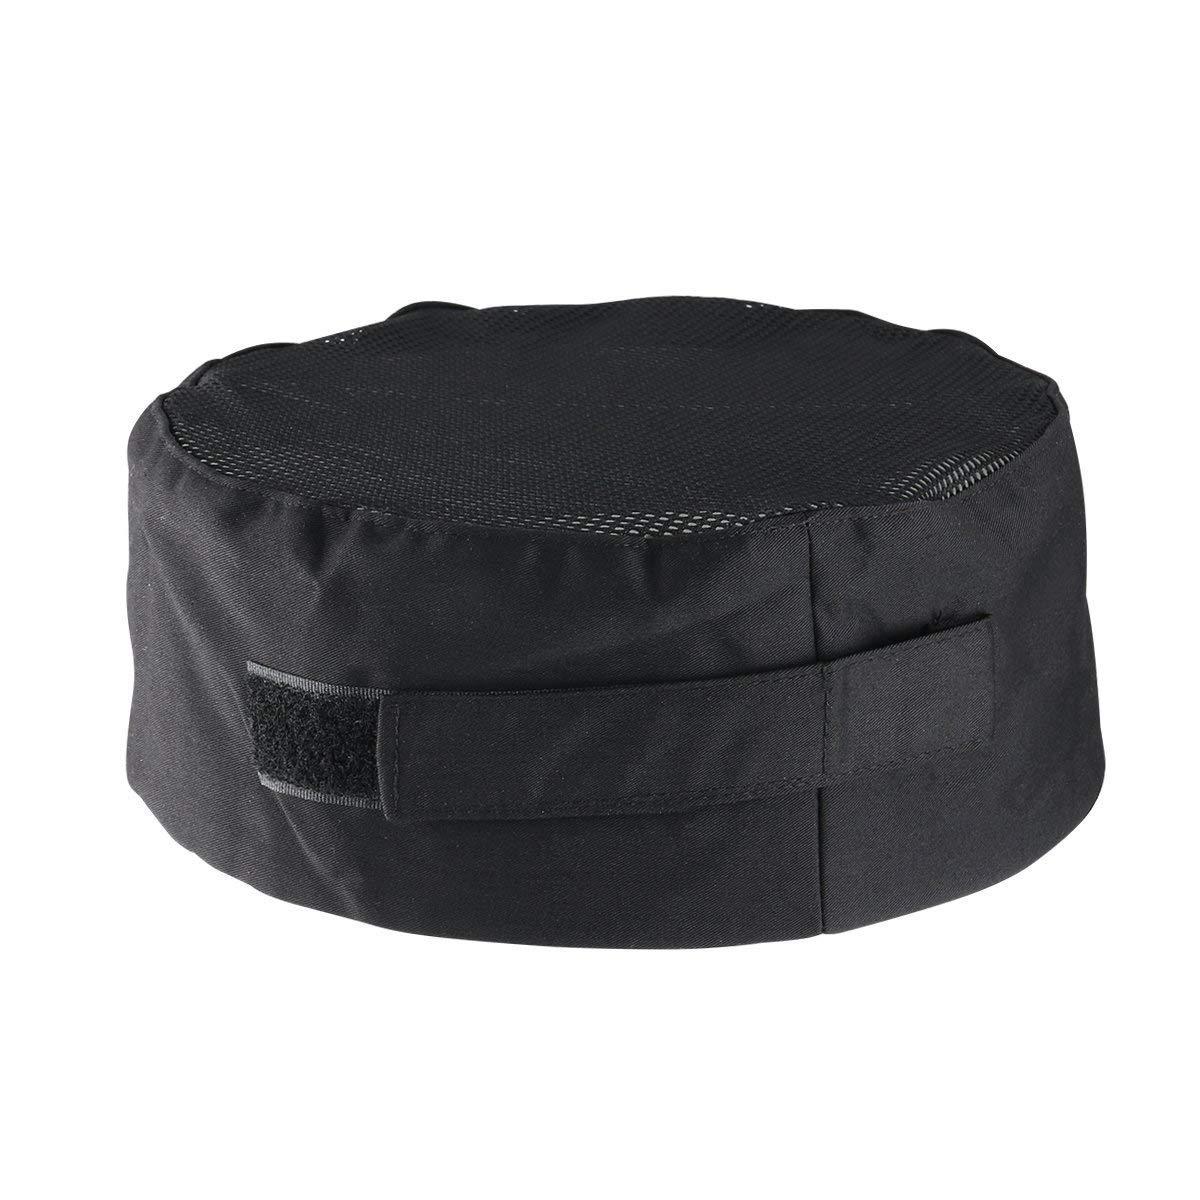 biggroup Black Adjustable Chef Hat Mesh Top Skull Cap Professional Catering Chef Hat